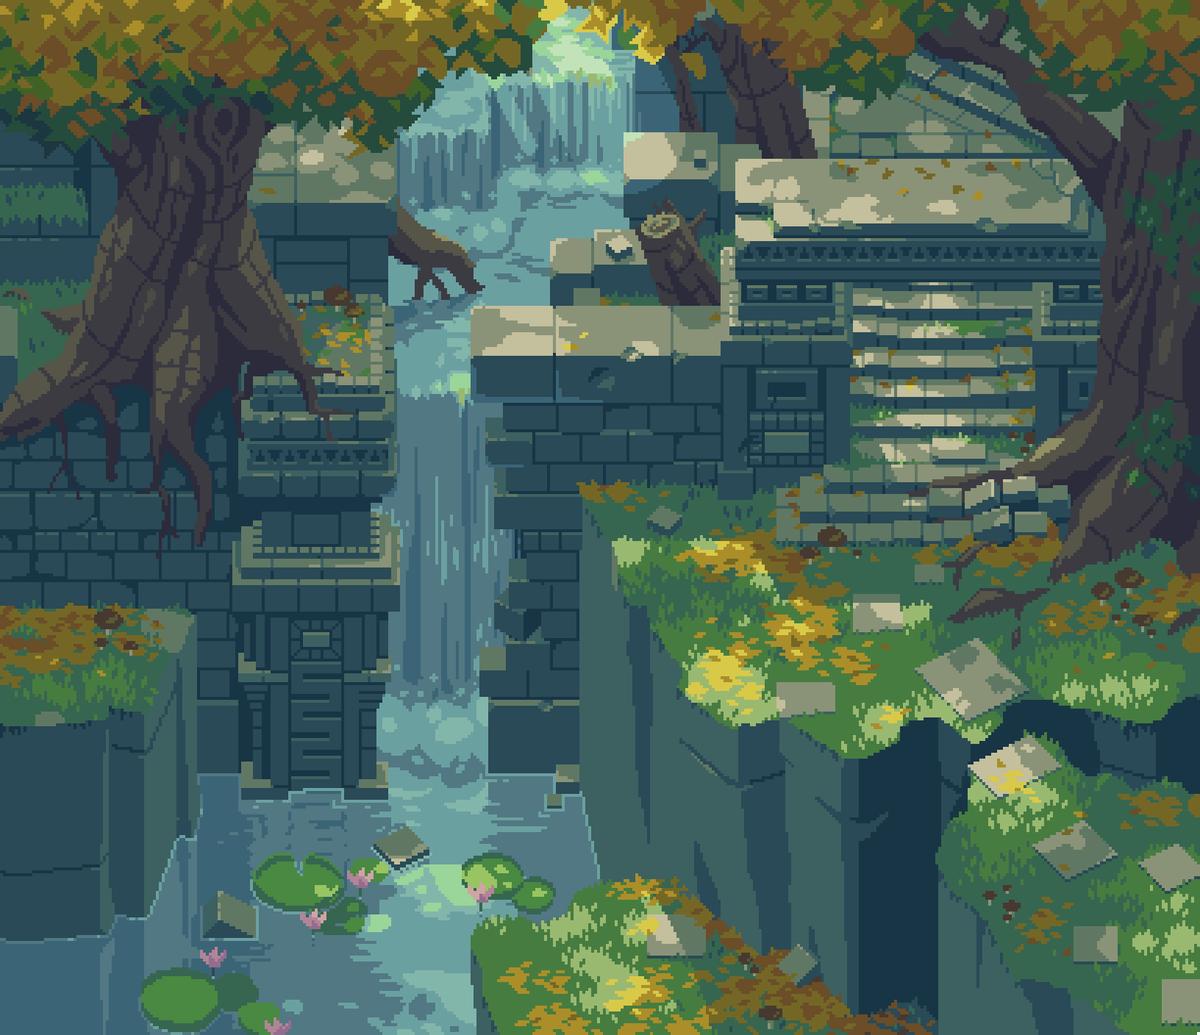 #PortfolioDay again? I'll take it! Pixel artist of overgrown ruins at you service!  https://www. patreon.com/NostalgiaTree      https://www. instagram.com/nostalgictree/    <br>http://pic.twitter.com/kK49uYvk5H